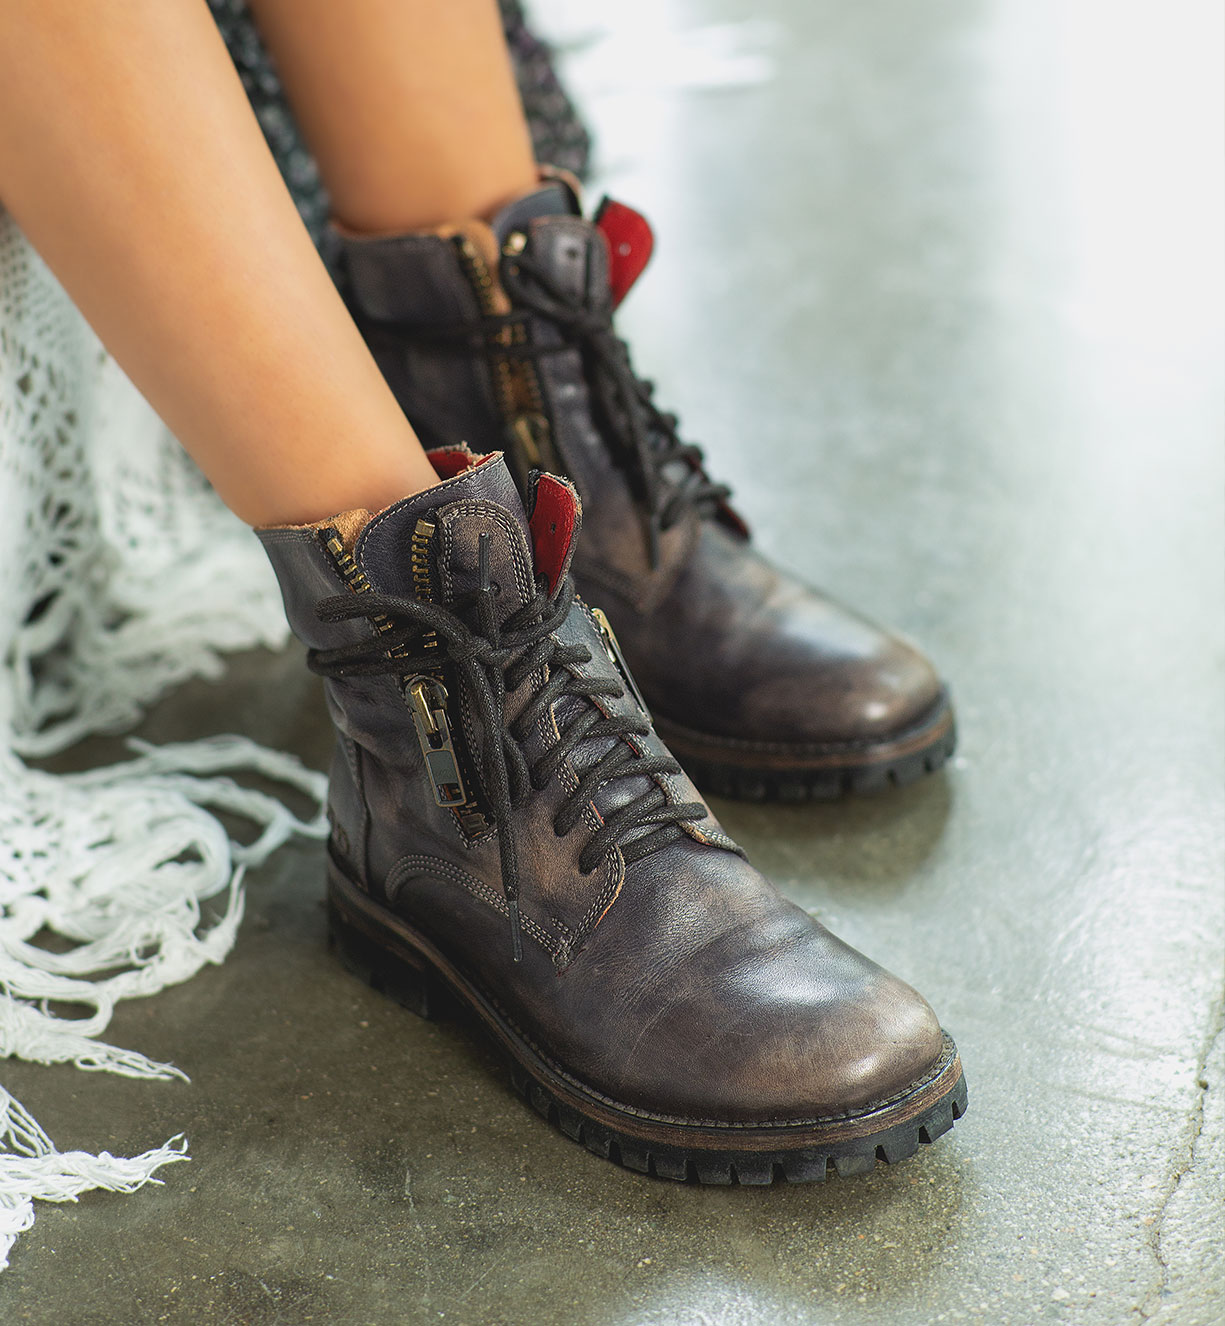 bedstu women's leather wedges